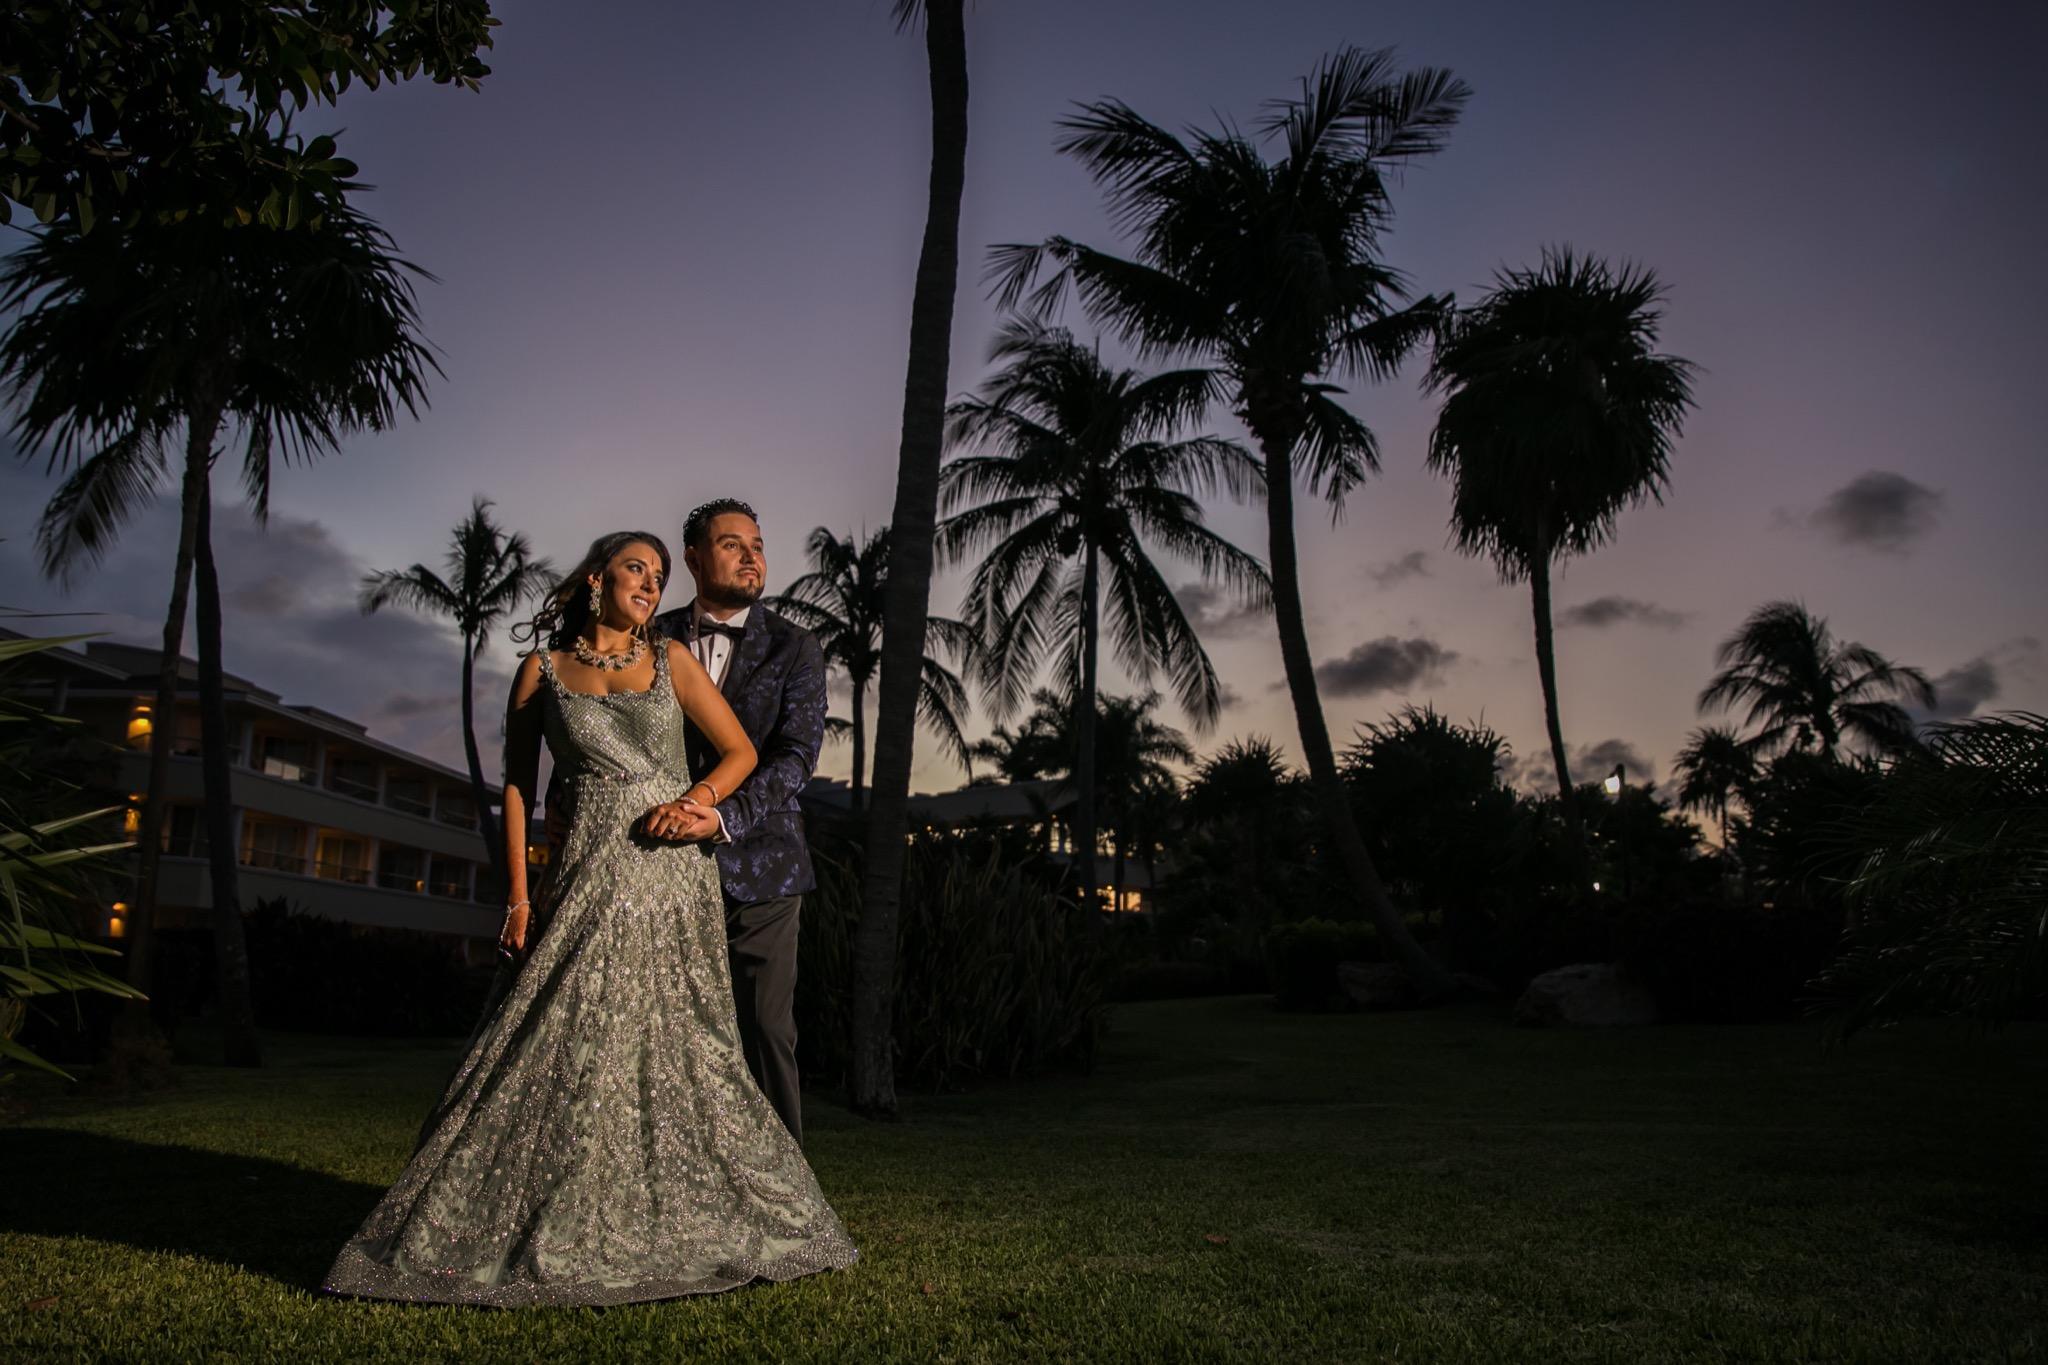 moon palace resort wedding